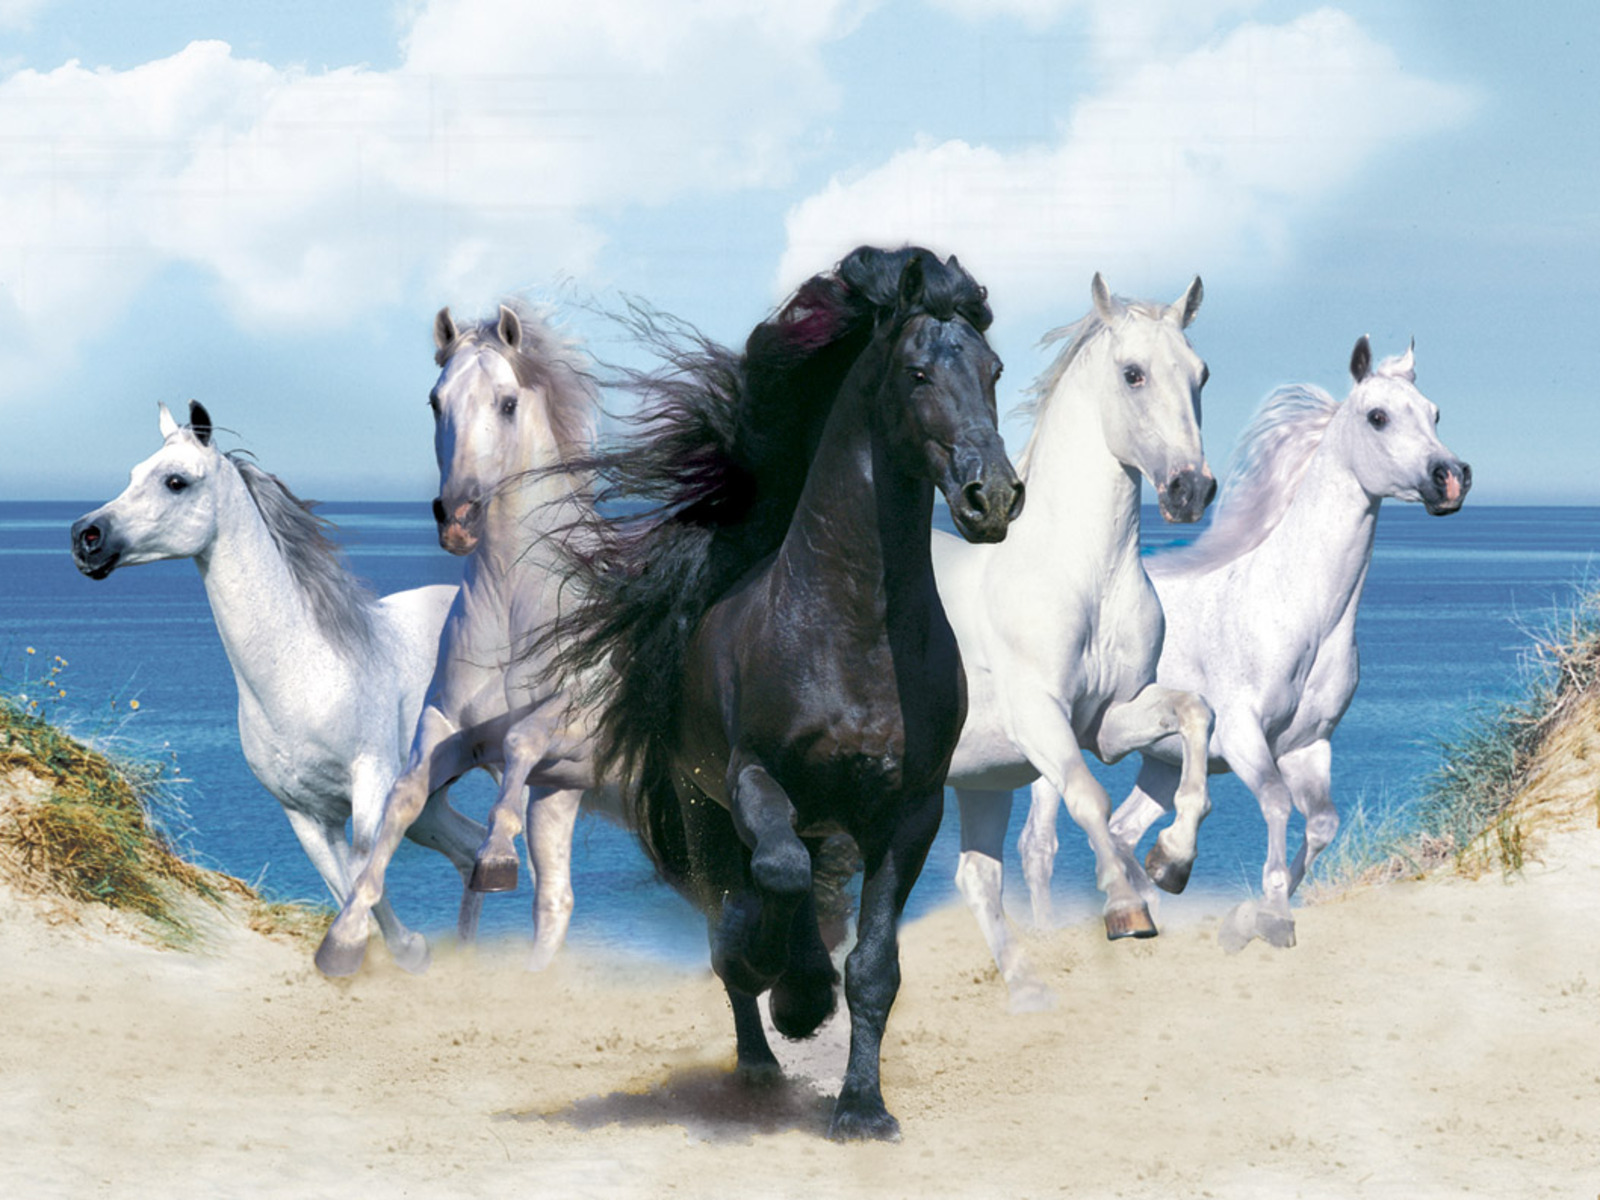 Top   Wallpaper Horse Desktop Background - The-best-top-desktop-horse-wallpapers-4  2018_366320.jpg